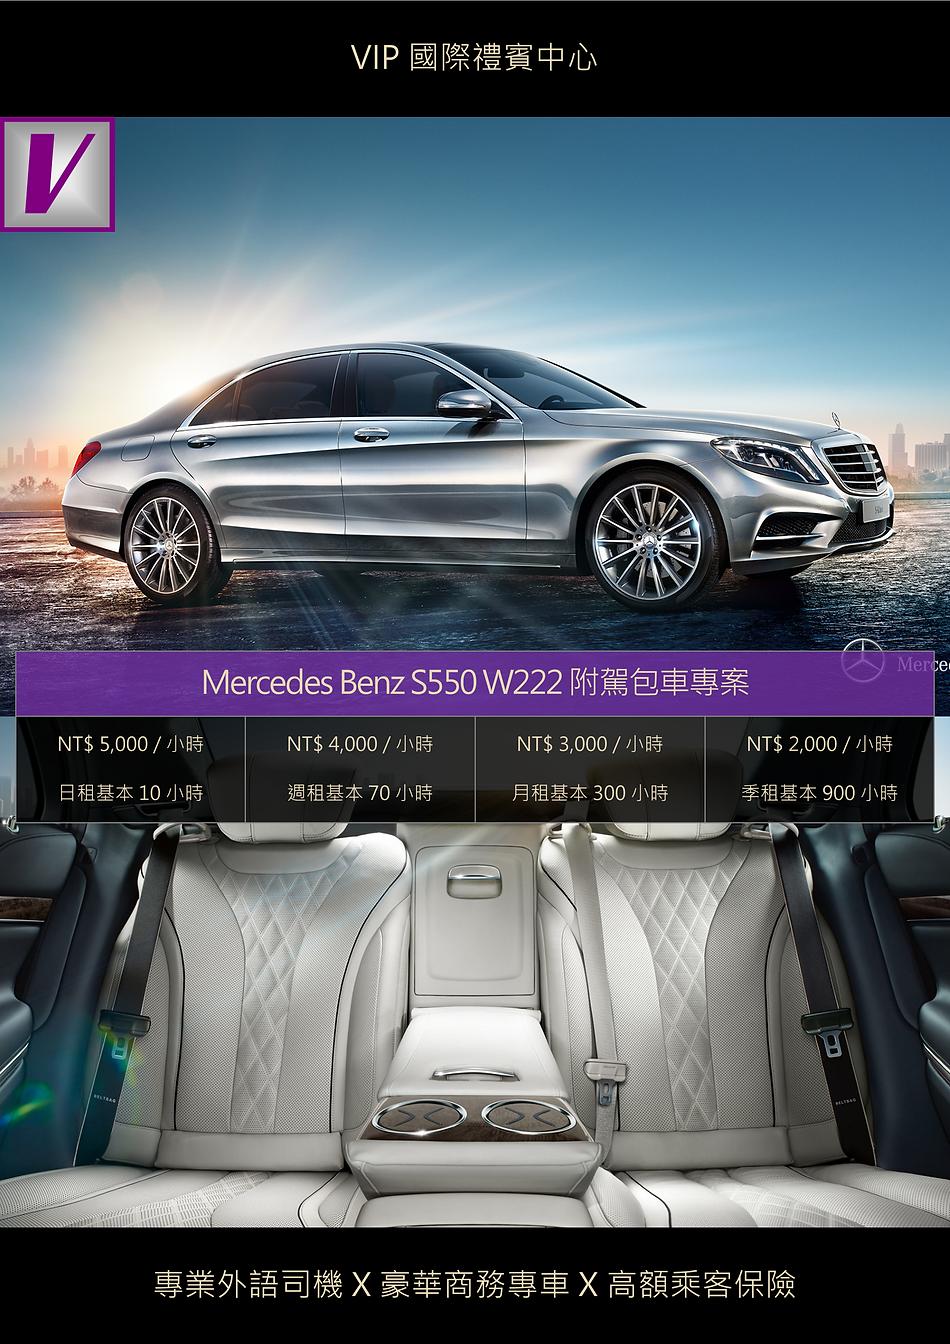 VIP國際禮賓中心 MERCEDES BENZ S550 W222 附駕包車專案 DM.png